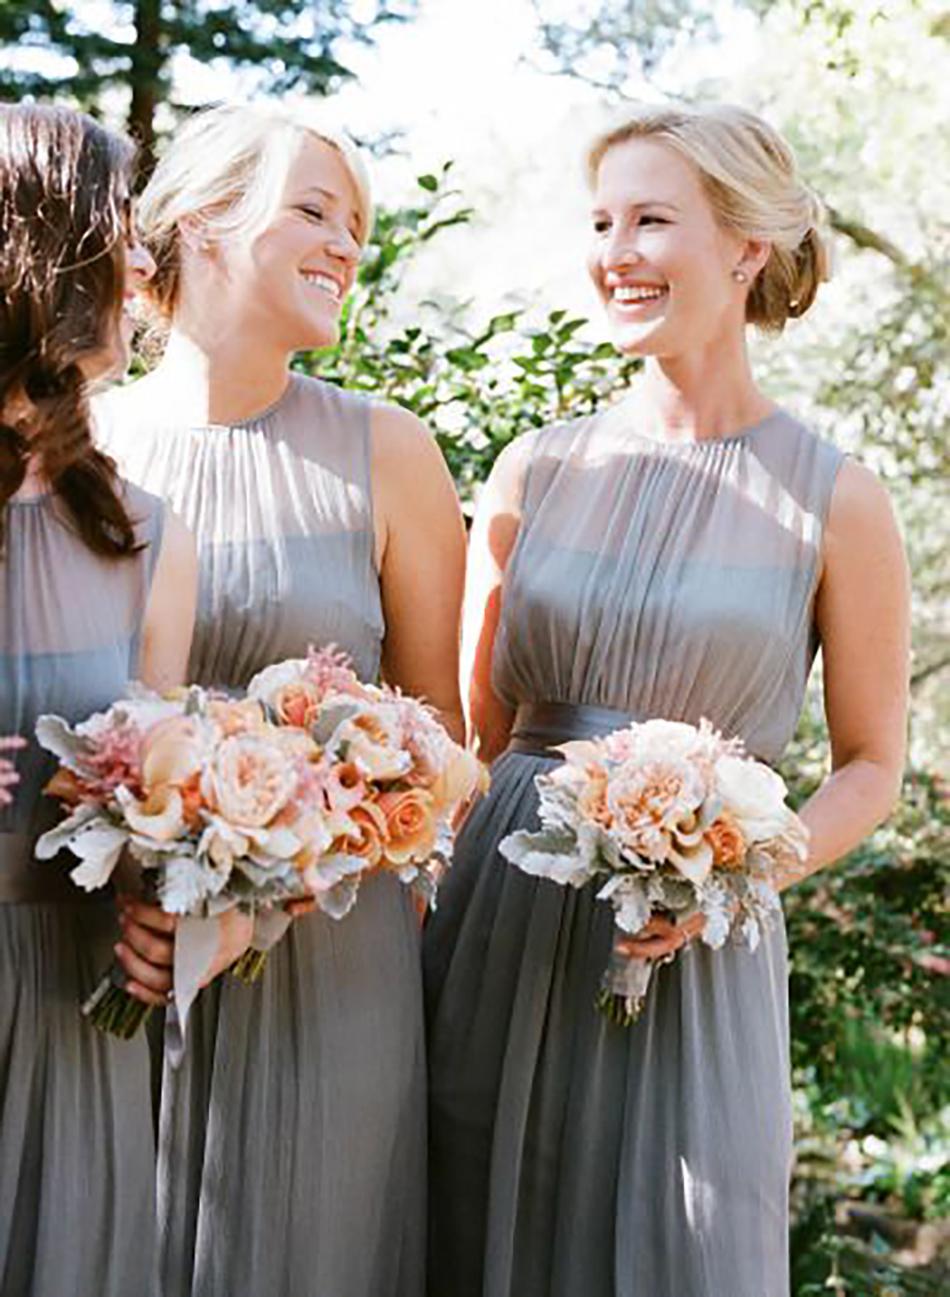 Wedding ideas by colour: metallic bridesmaid dresses